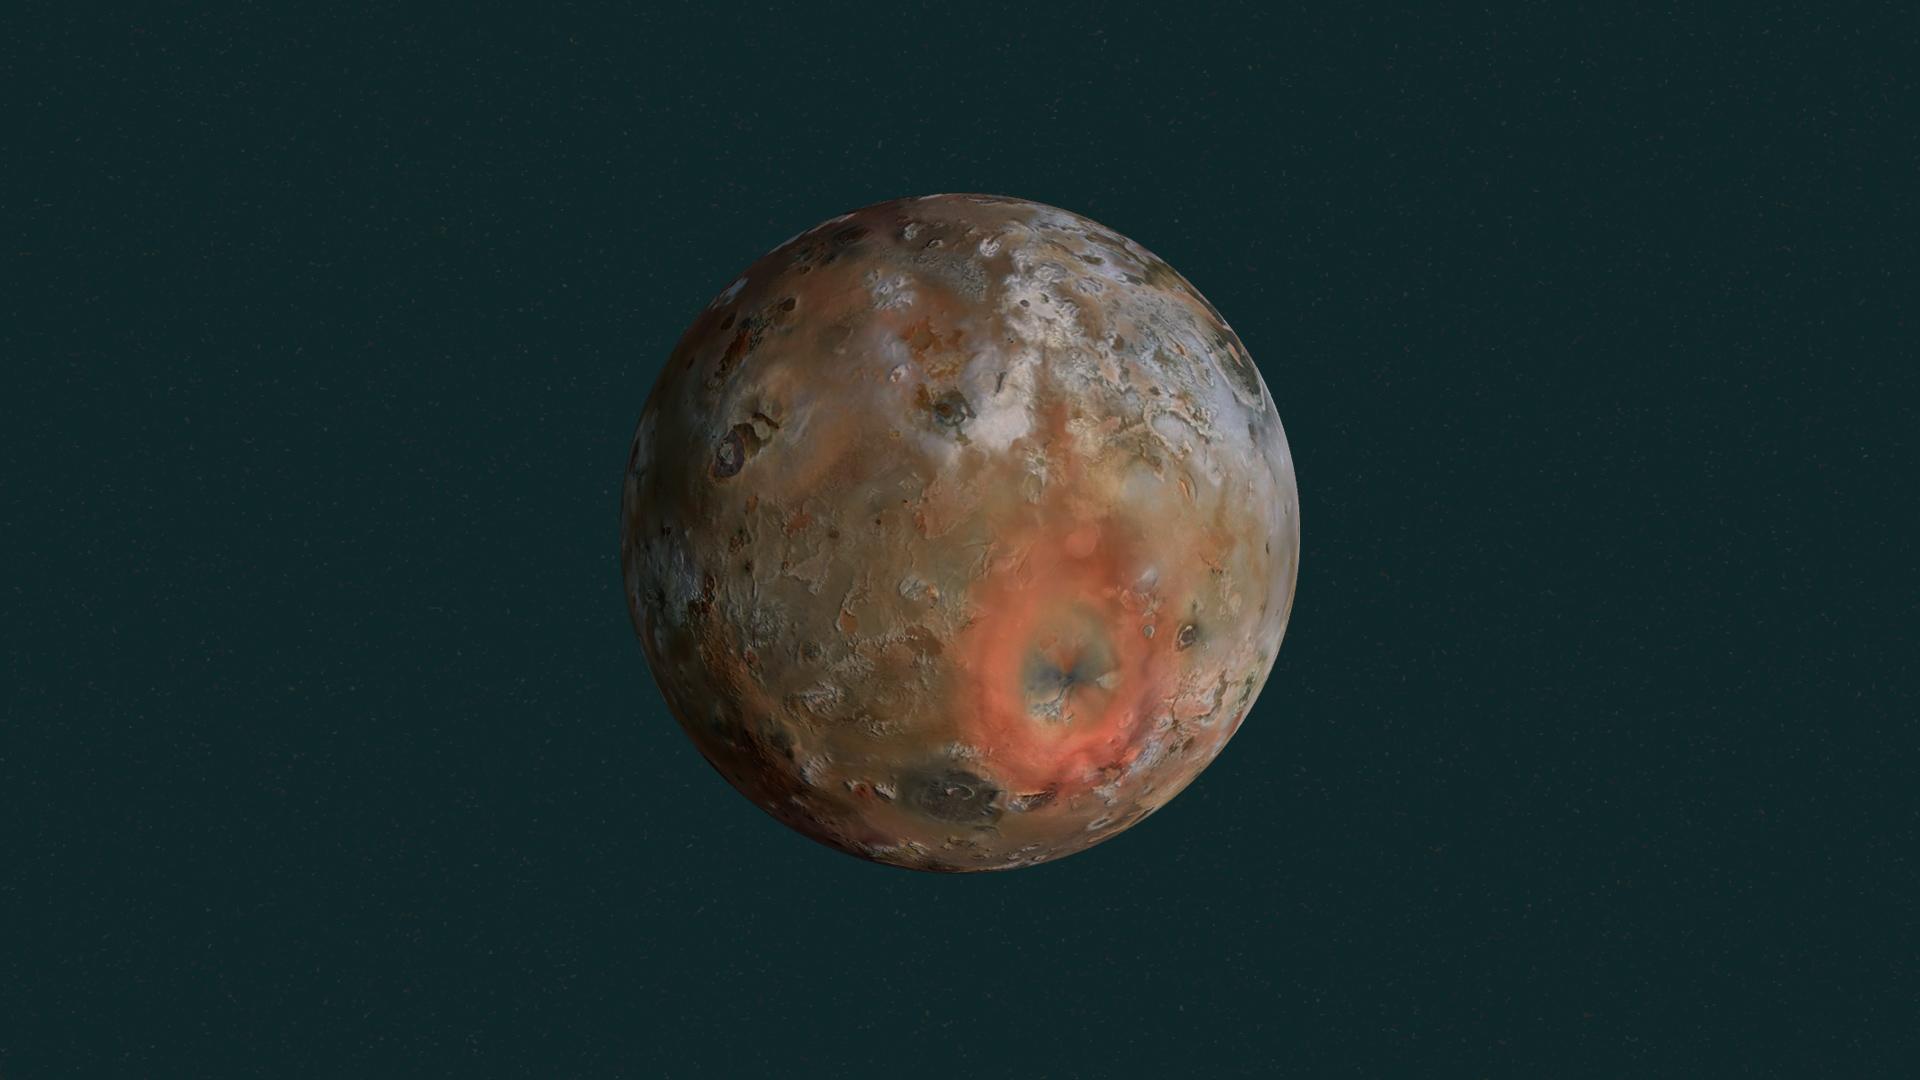 Solar System Exploration: NASA Science